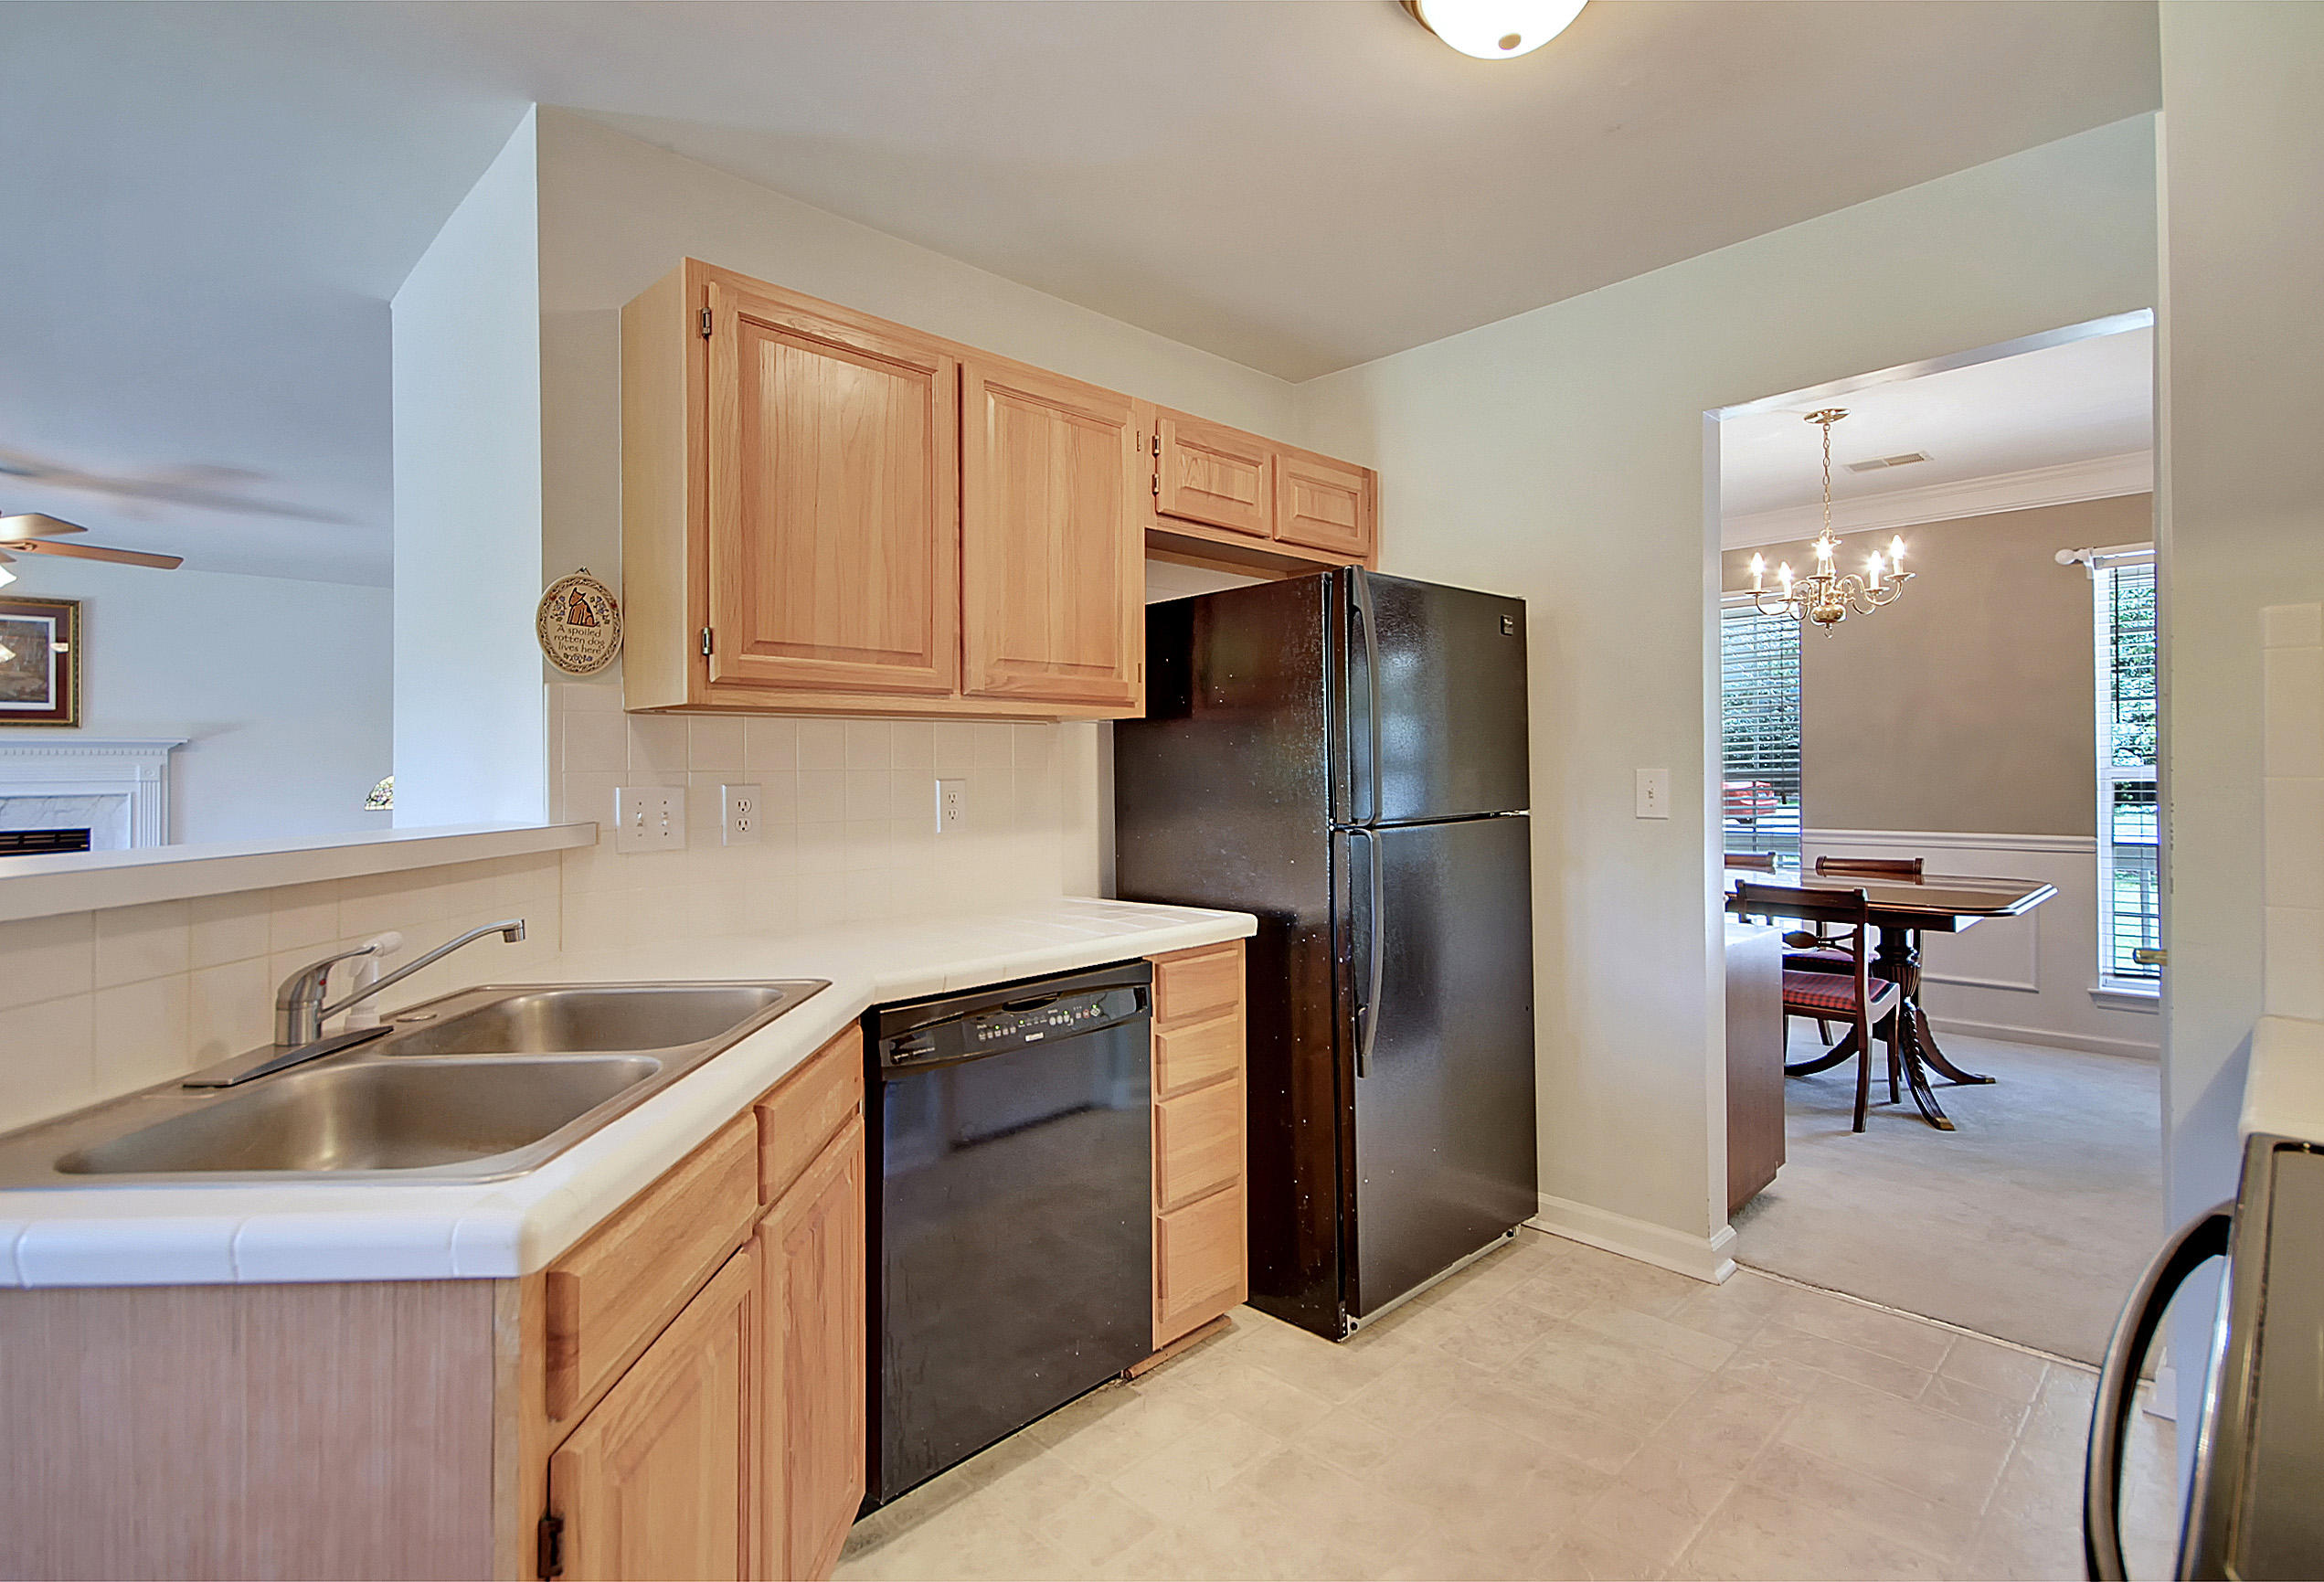 Center Lake Homes For Sale - 1252 Center Lake, Mount Pleasant, SC - 21